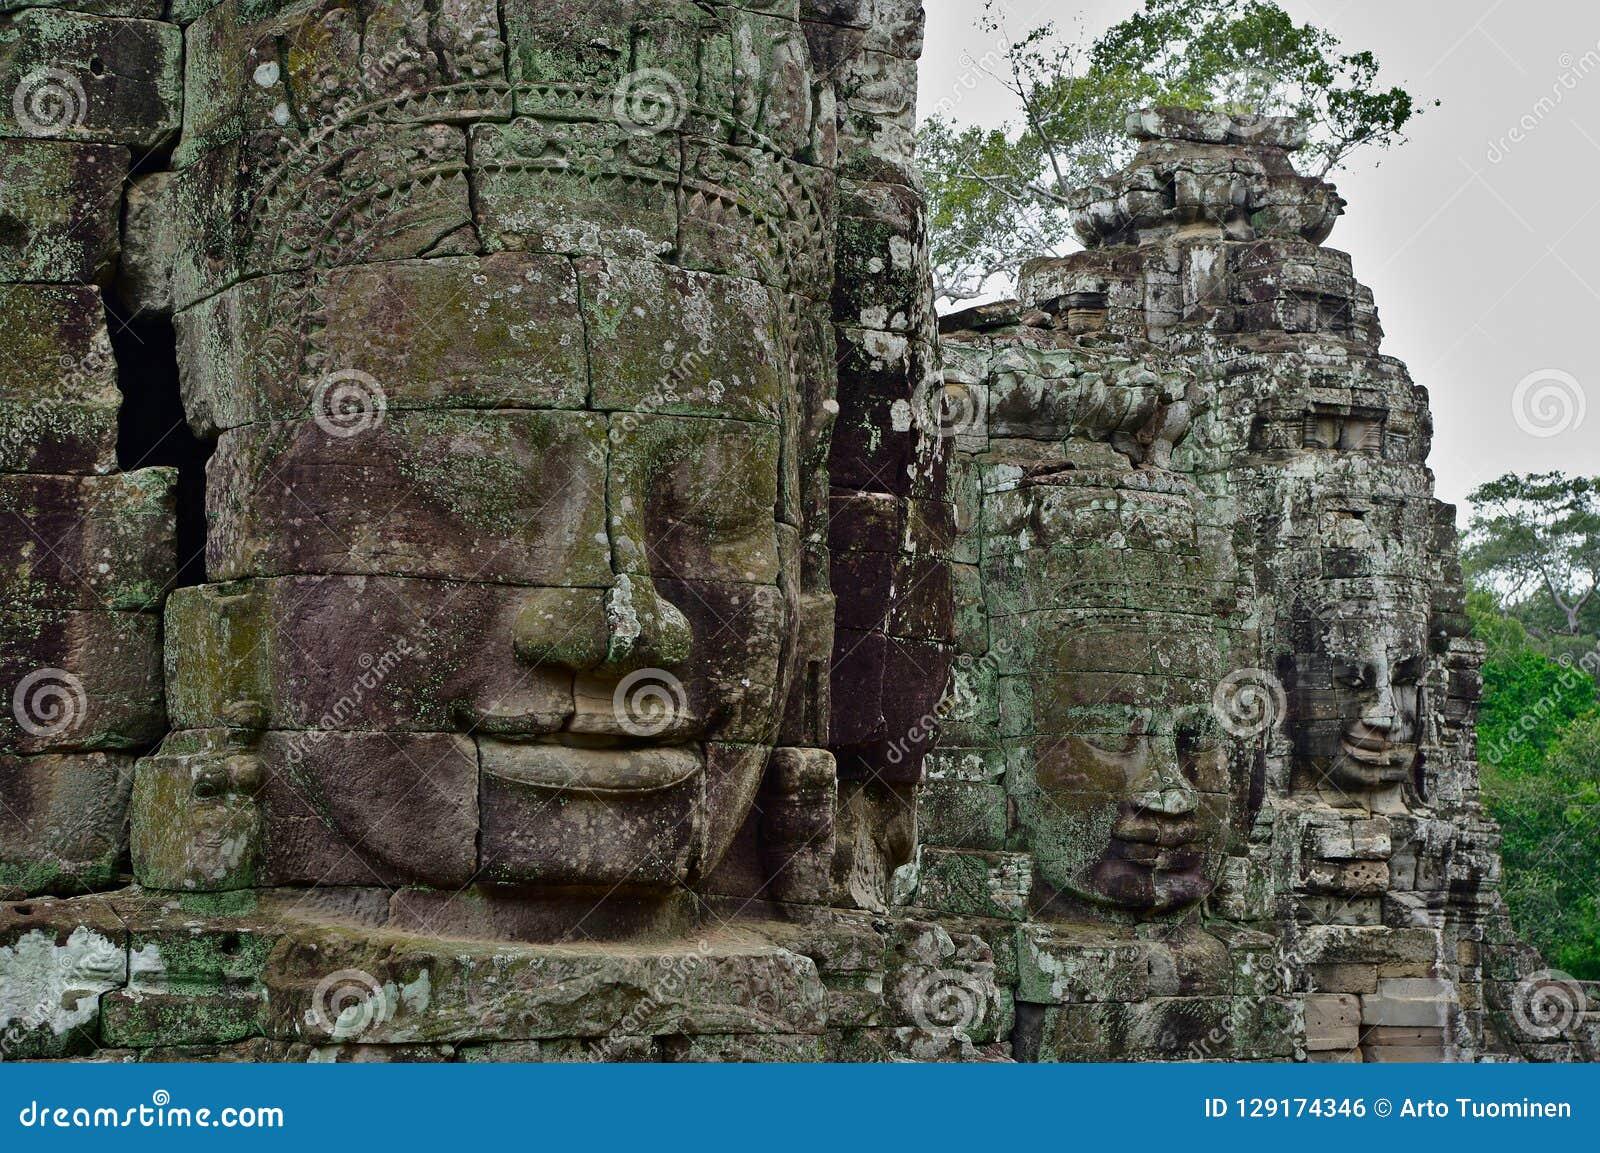 Stone faces of Bayon temple, Siemreap, Cambodia.